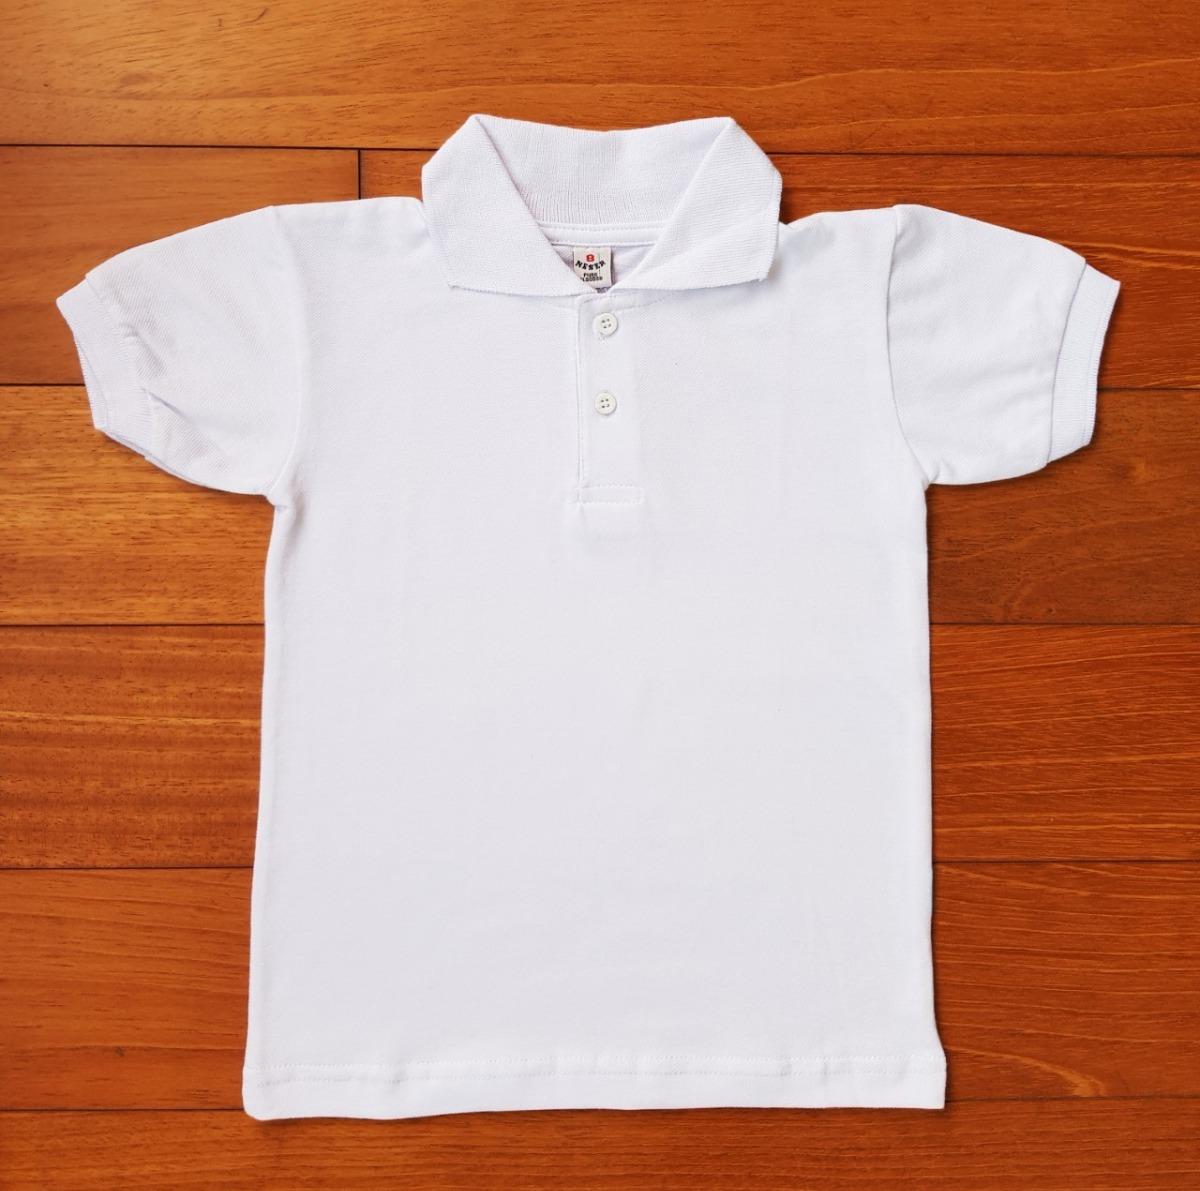 469ccd691c0 chomba piqué mangas cortas blanca para niños talle 6 al 12. Cargando zoom.